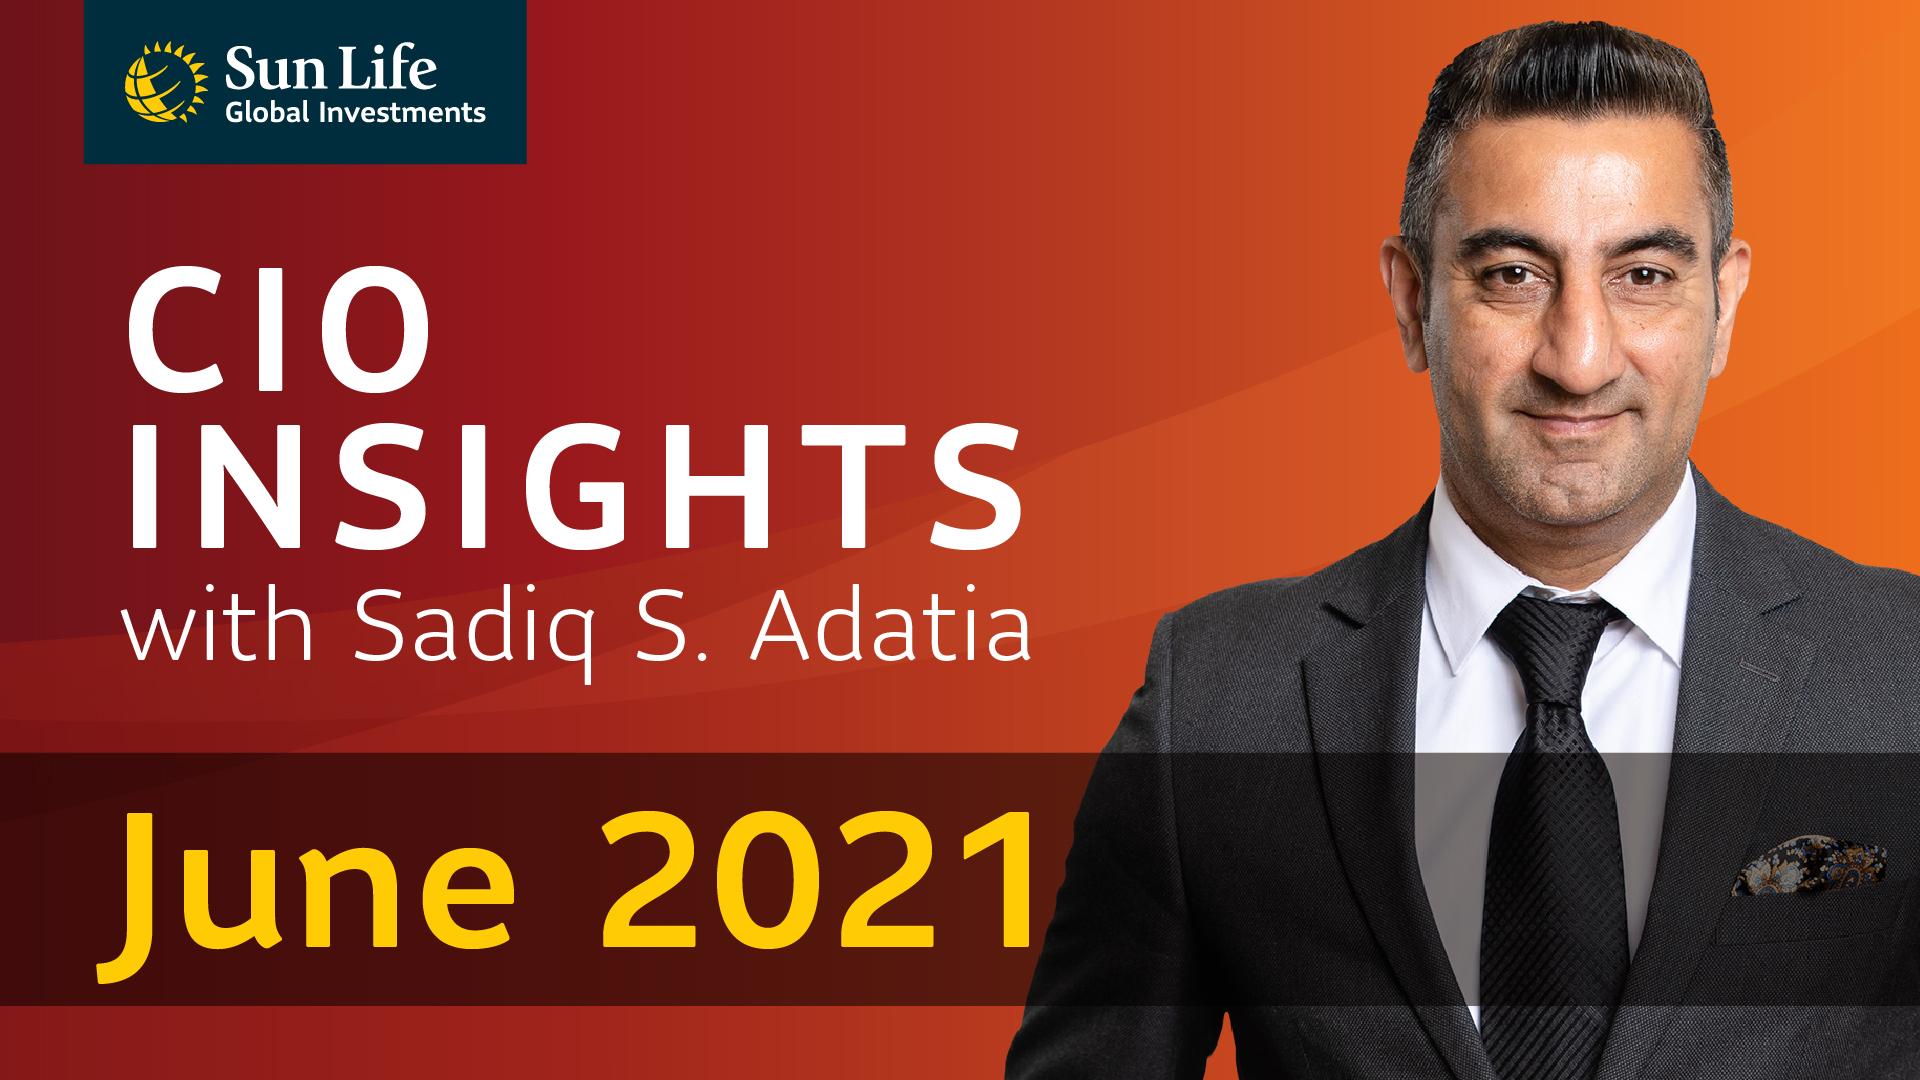 CIO Insights with Sadiq S. Adatia